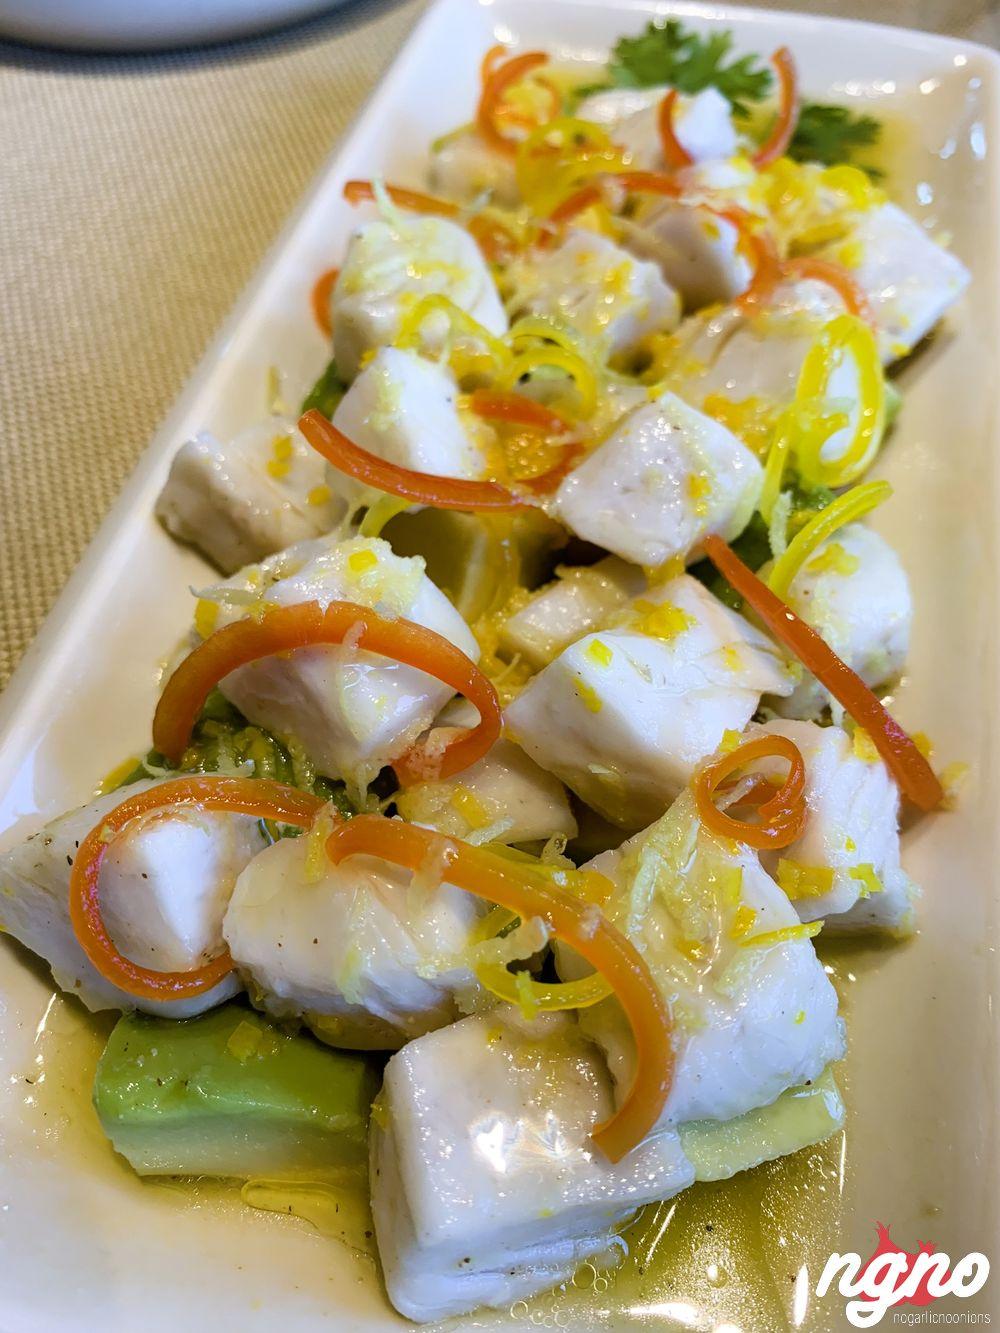 babel-restaurant-dubai-food-nogarlicnoonions-432018-11-24-07-31-38